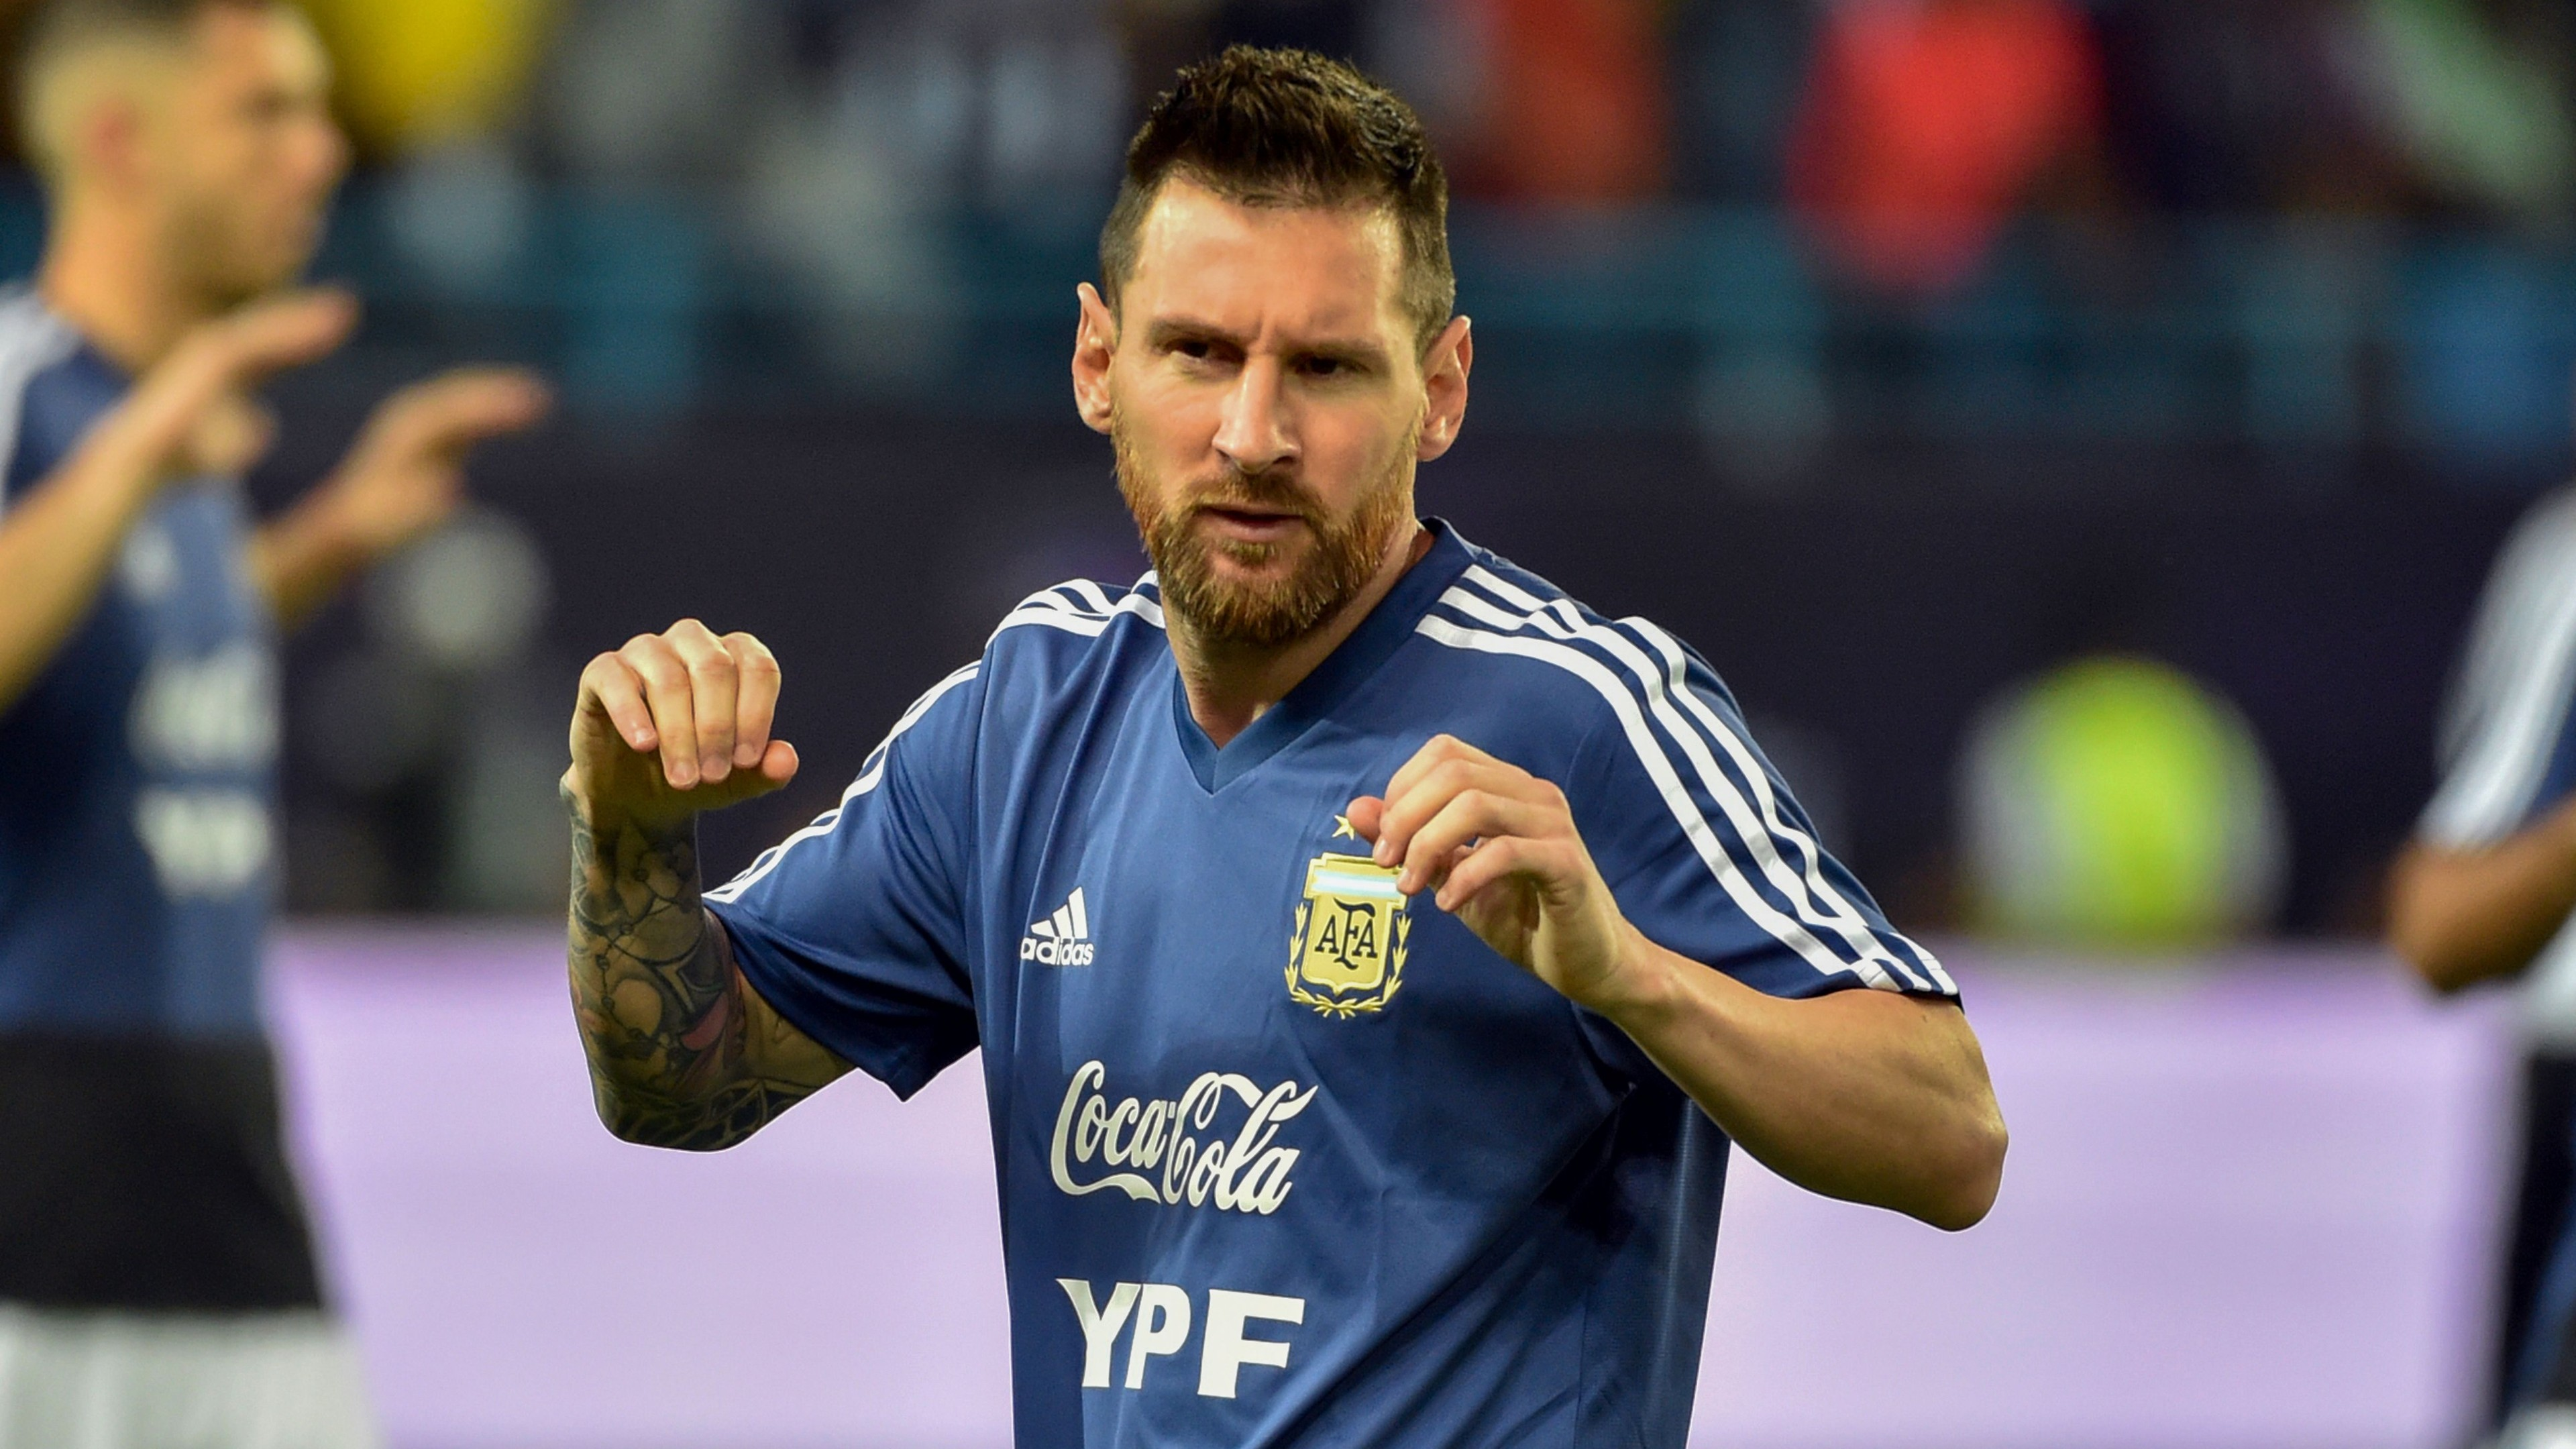 Cầu thủ Lionel Messi